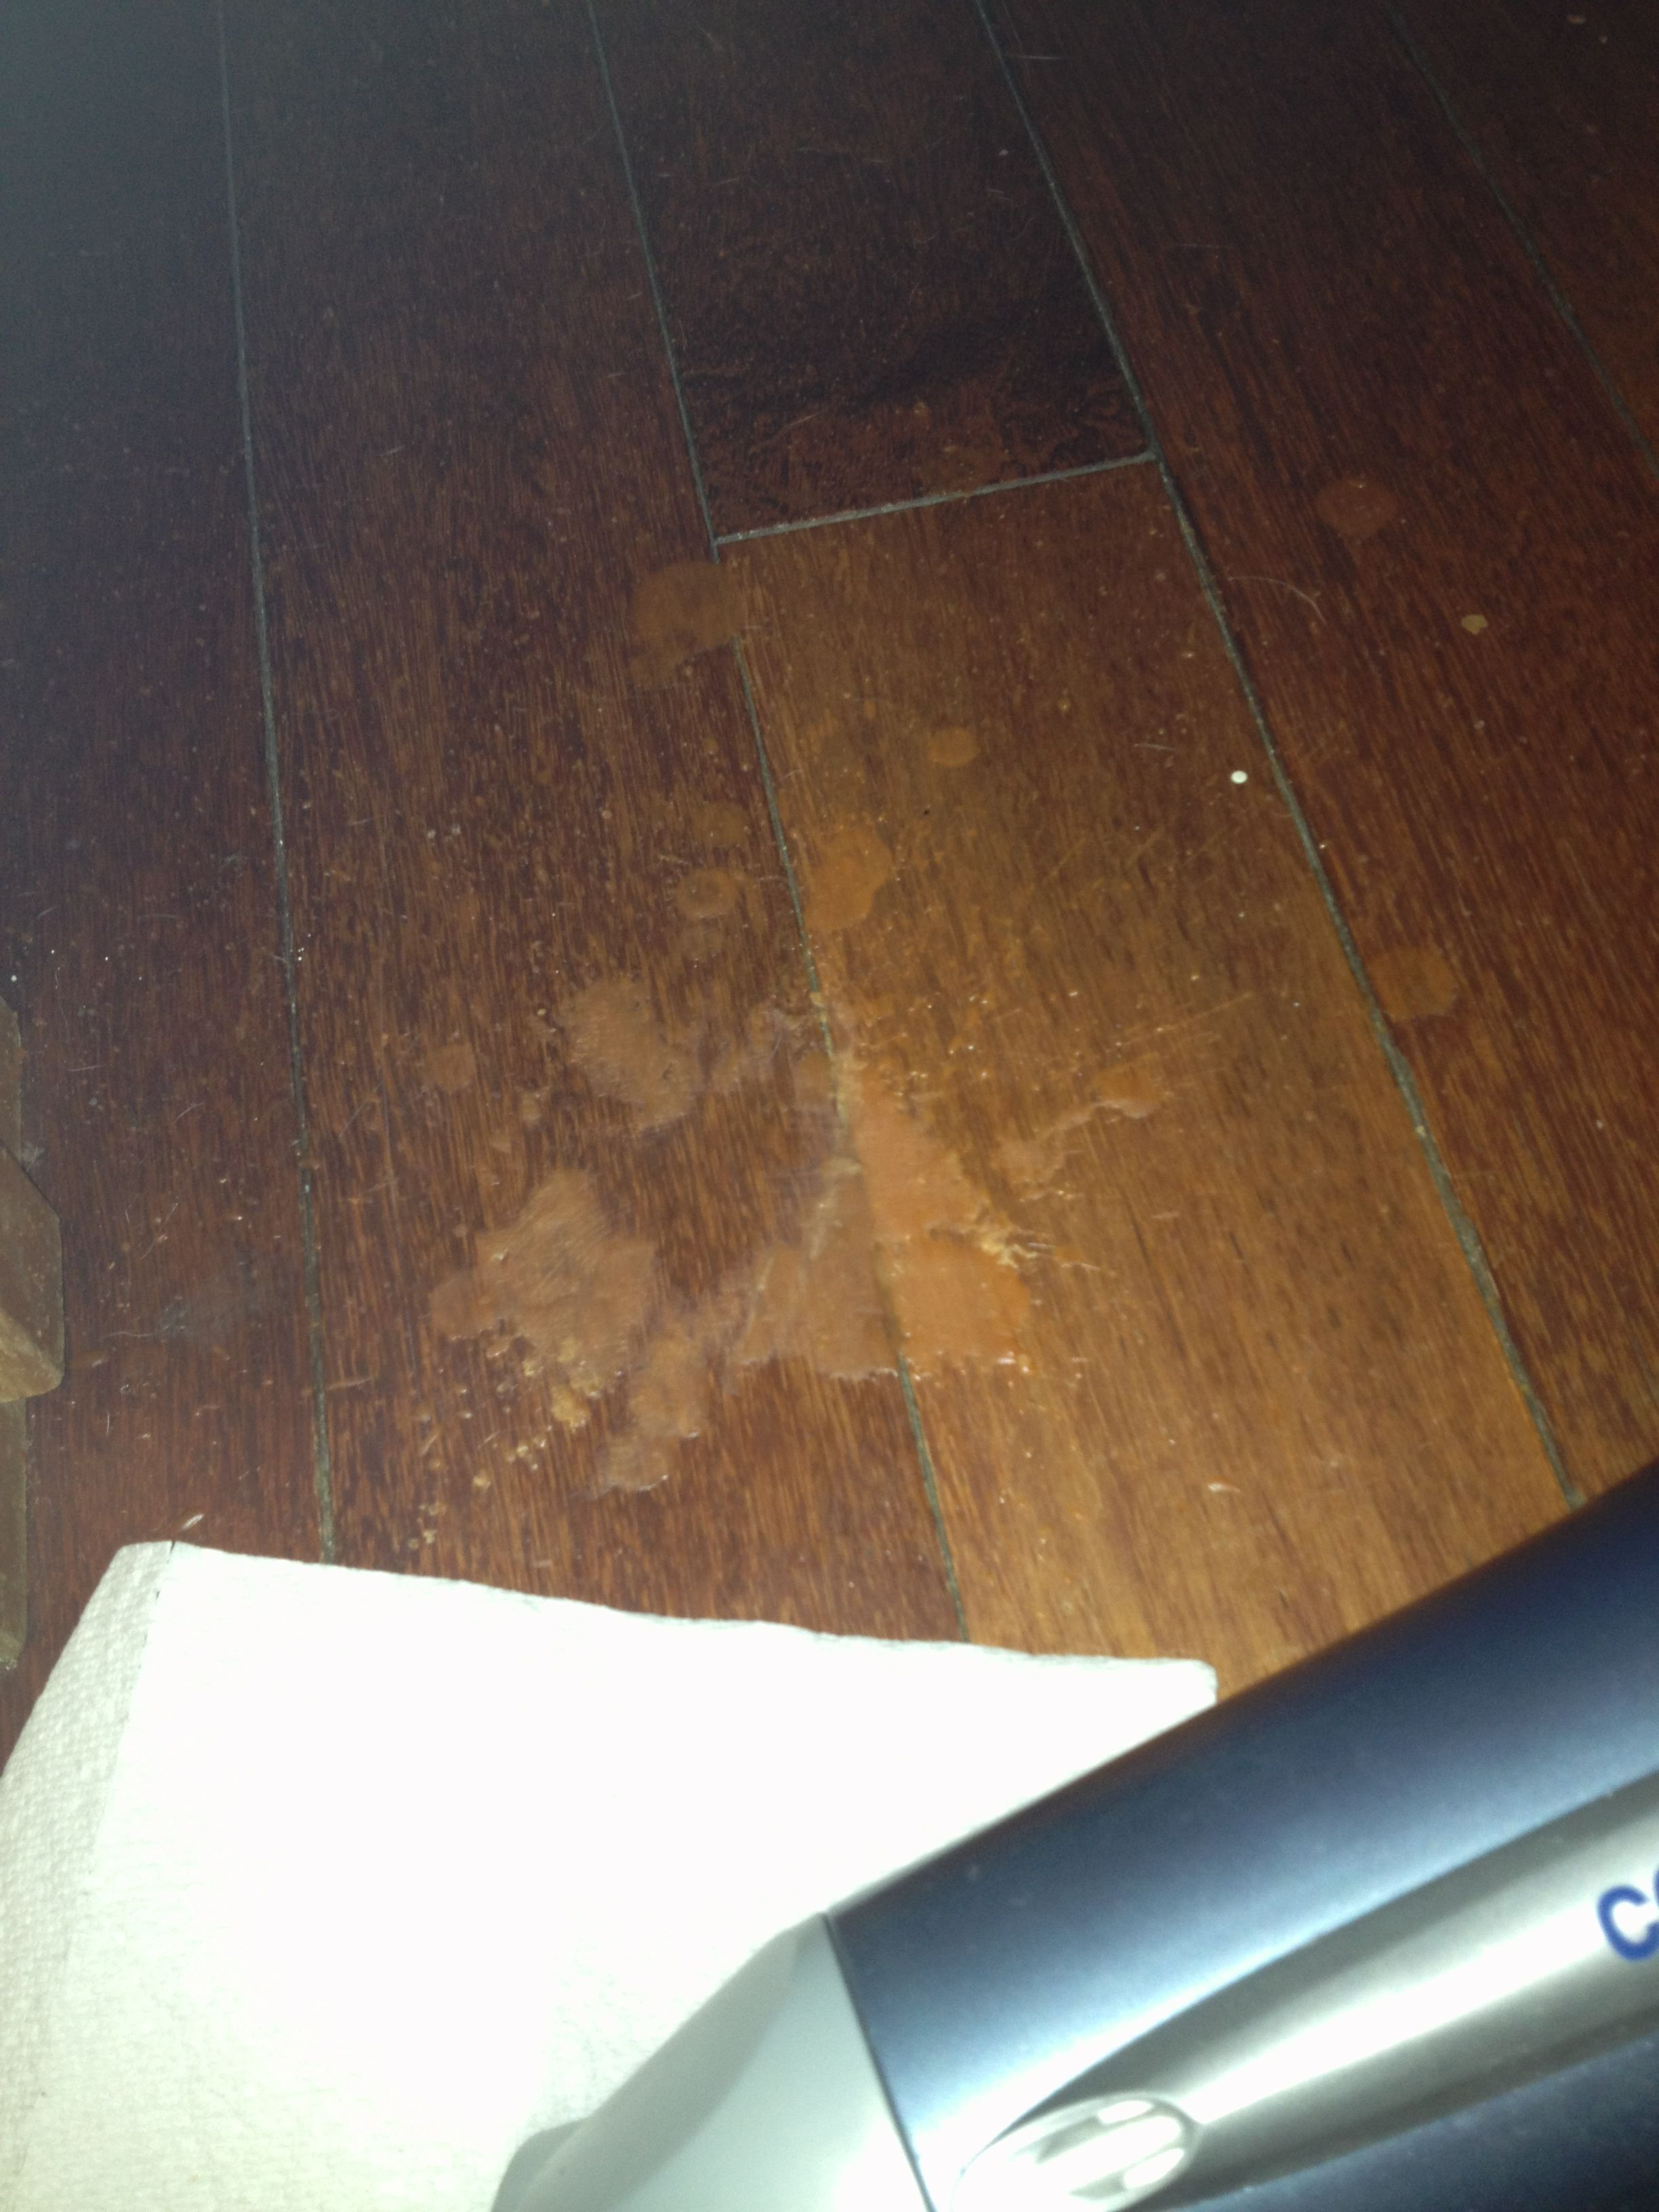 Candle Wax Off Of Hardwood Floors Hair Dryer Napkin